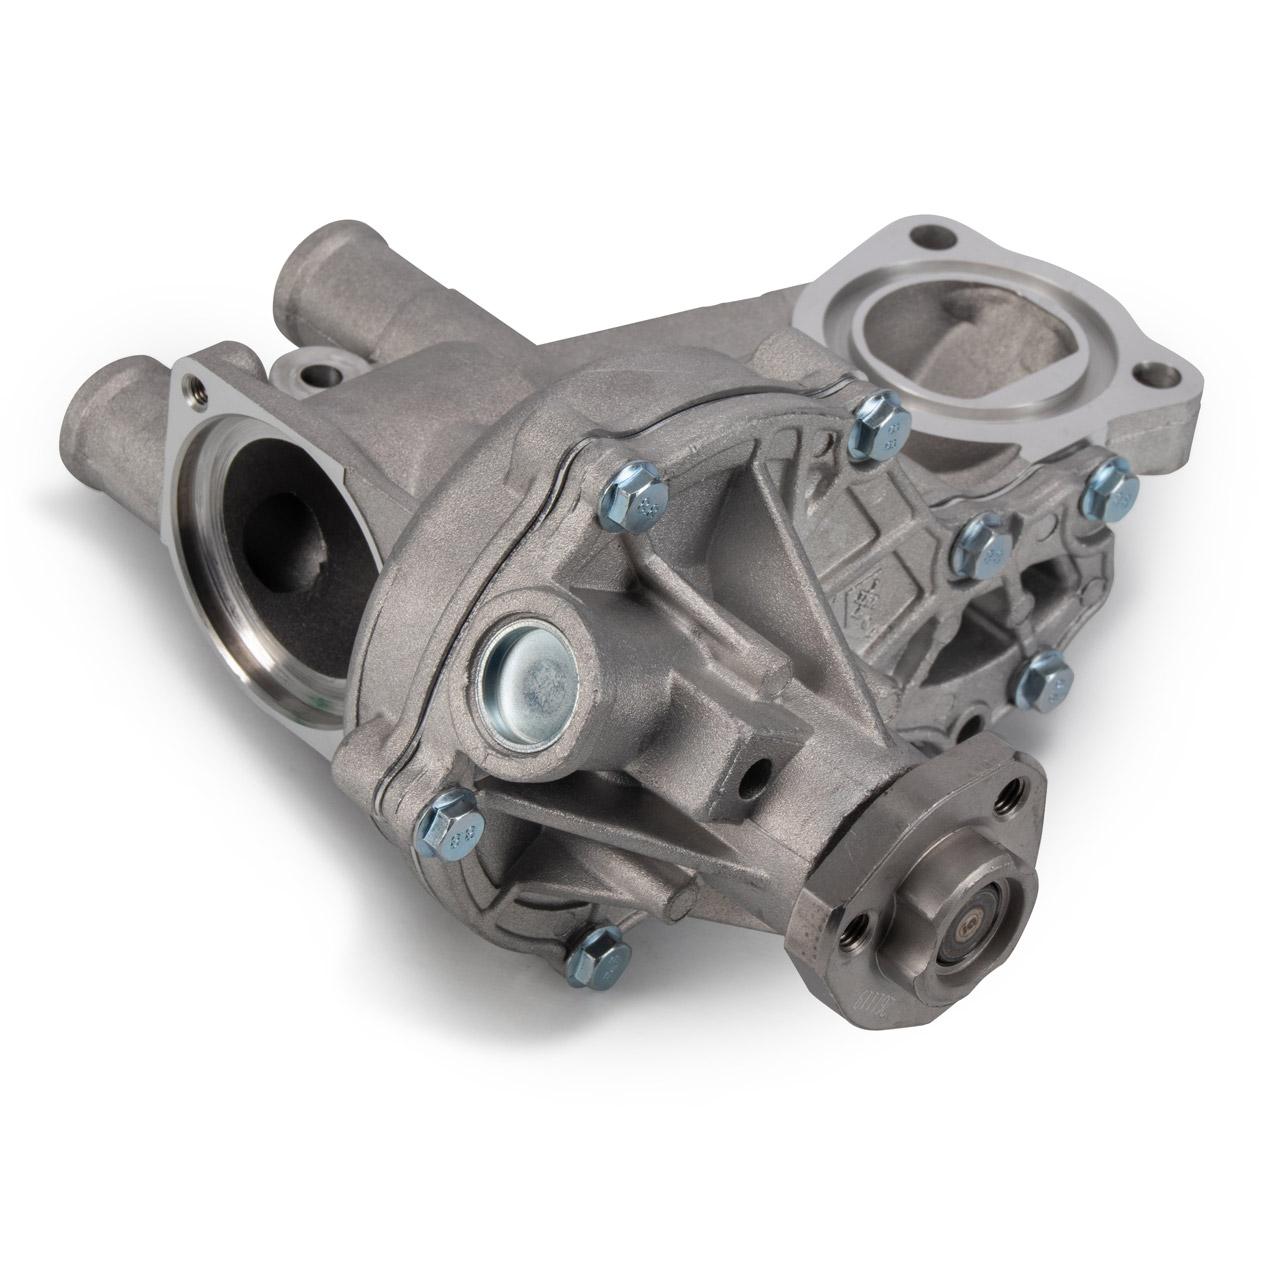 INA verstärkte Wasserpumpe + Gehäuse AUDI SEAT VW 1.6 1.8 1.9 GTI 16V G60 PG TDI 2.0